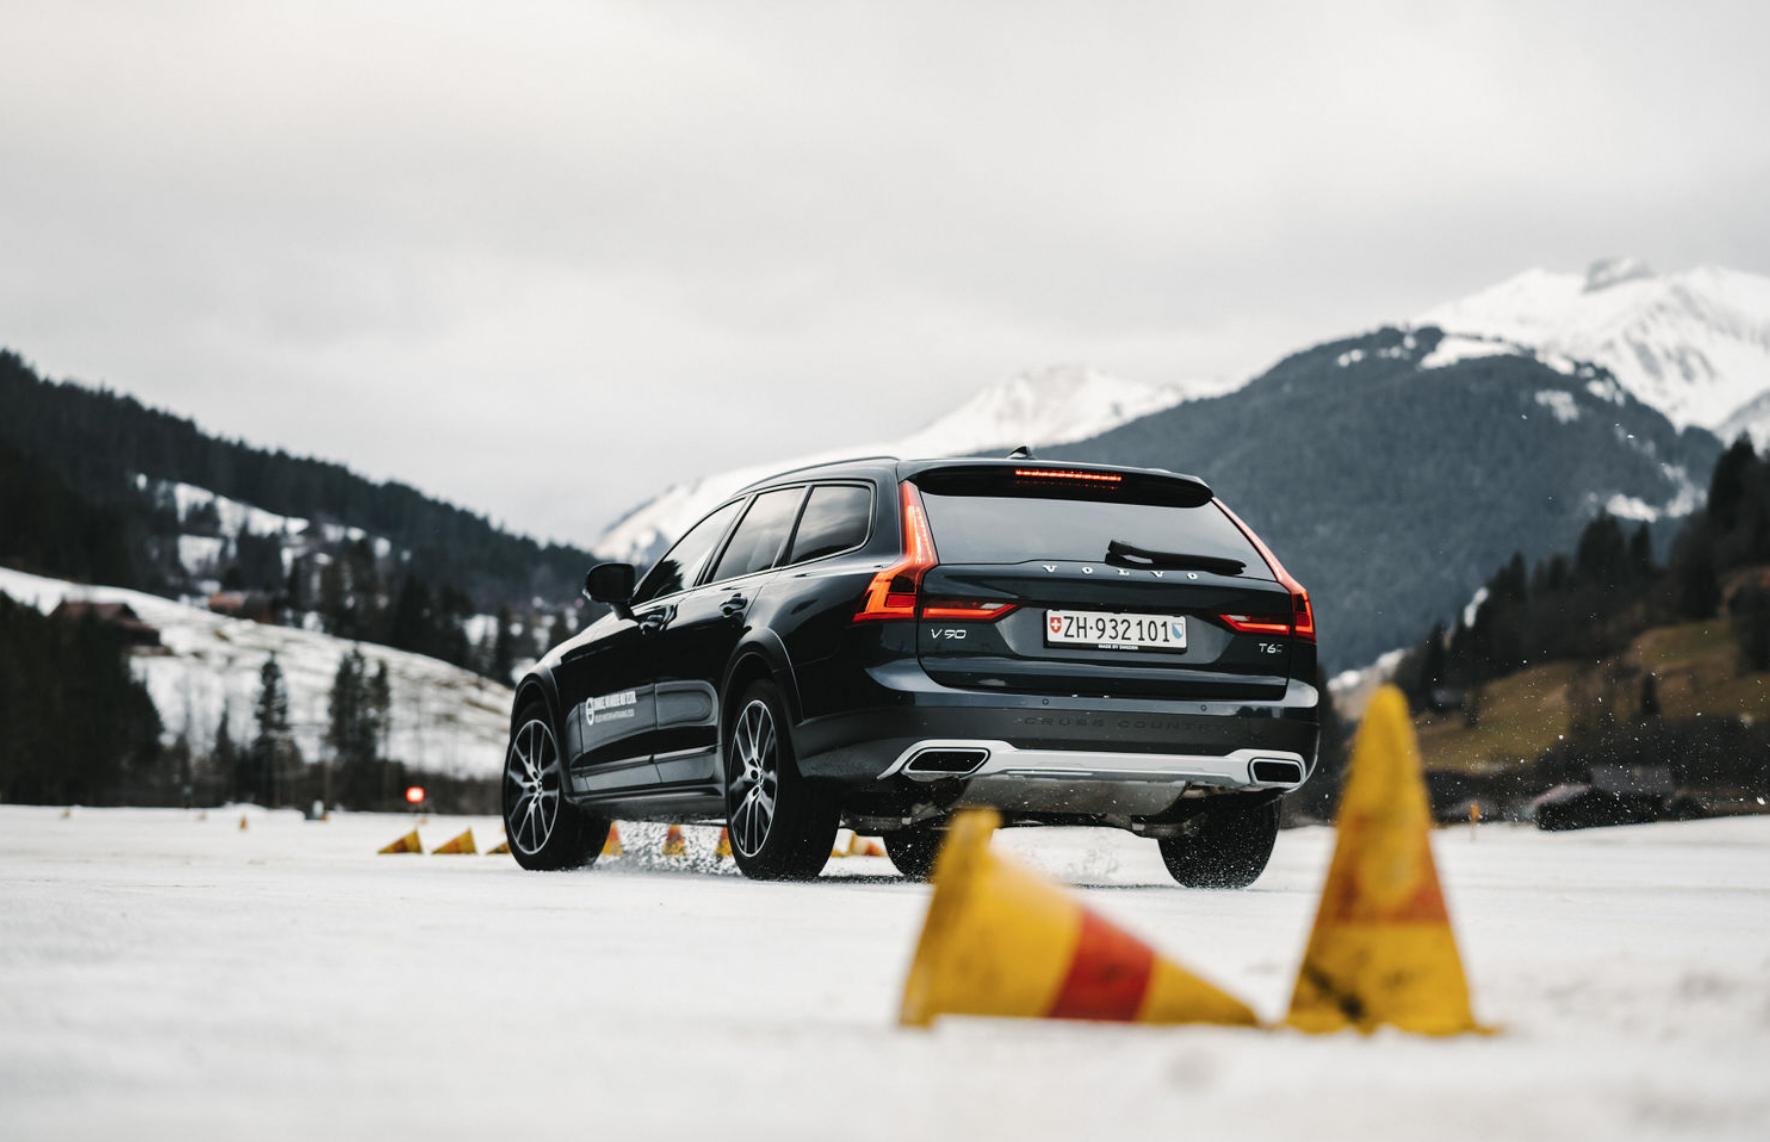 Volvo_Winterfahrtraining_Gstaad_9